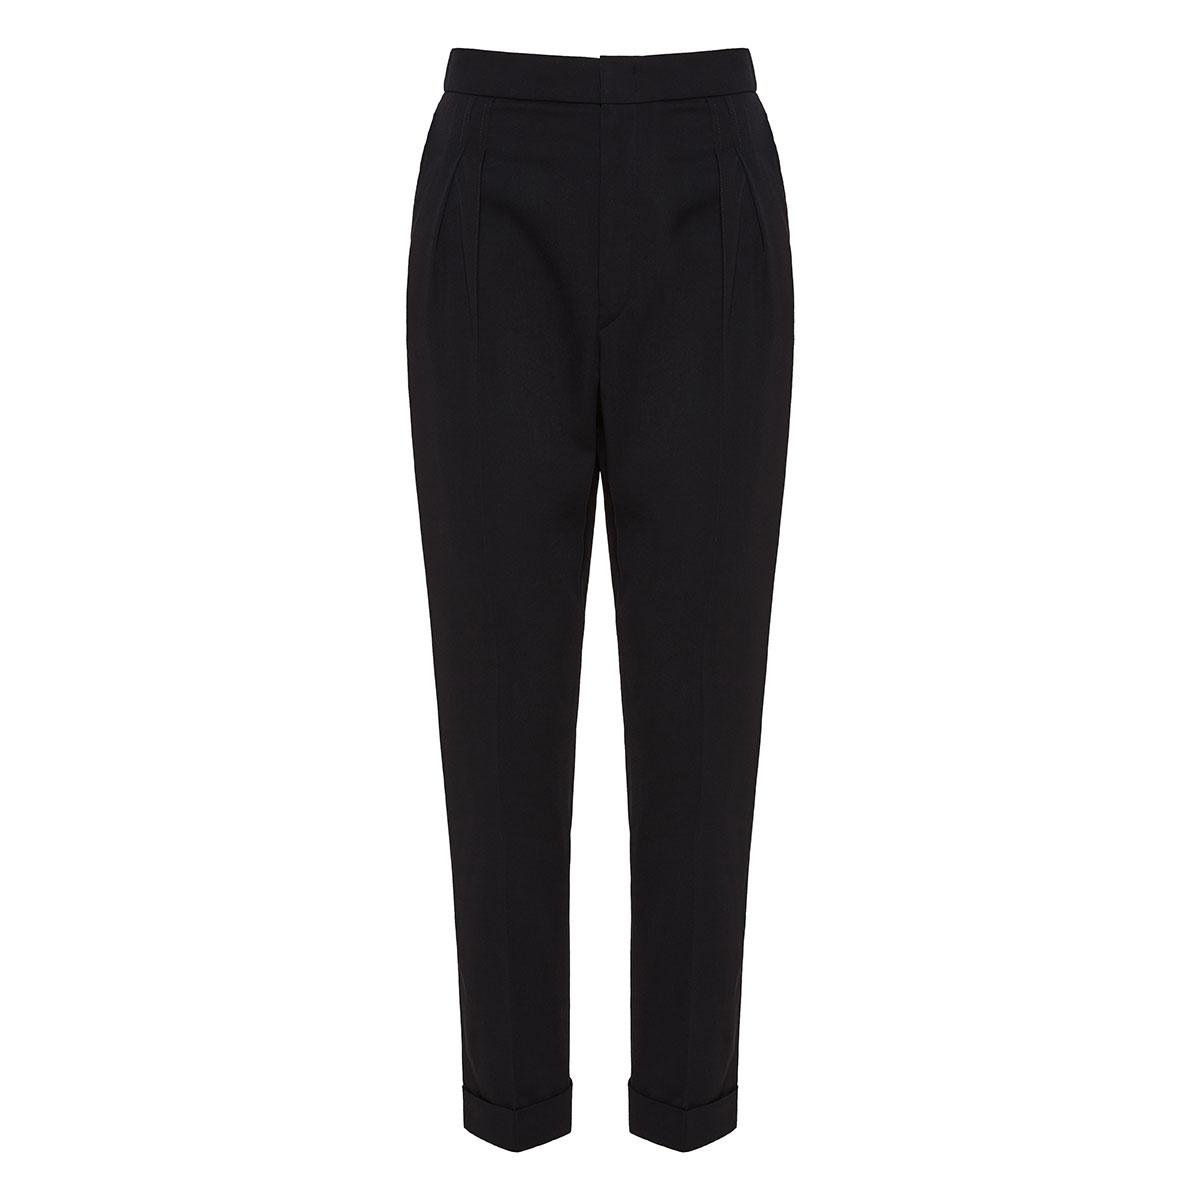 High-waist wool tailored trousers